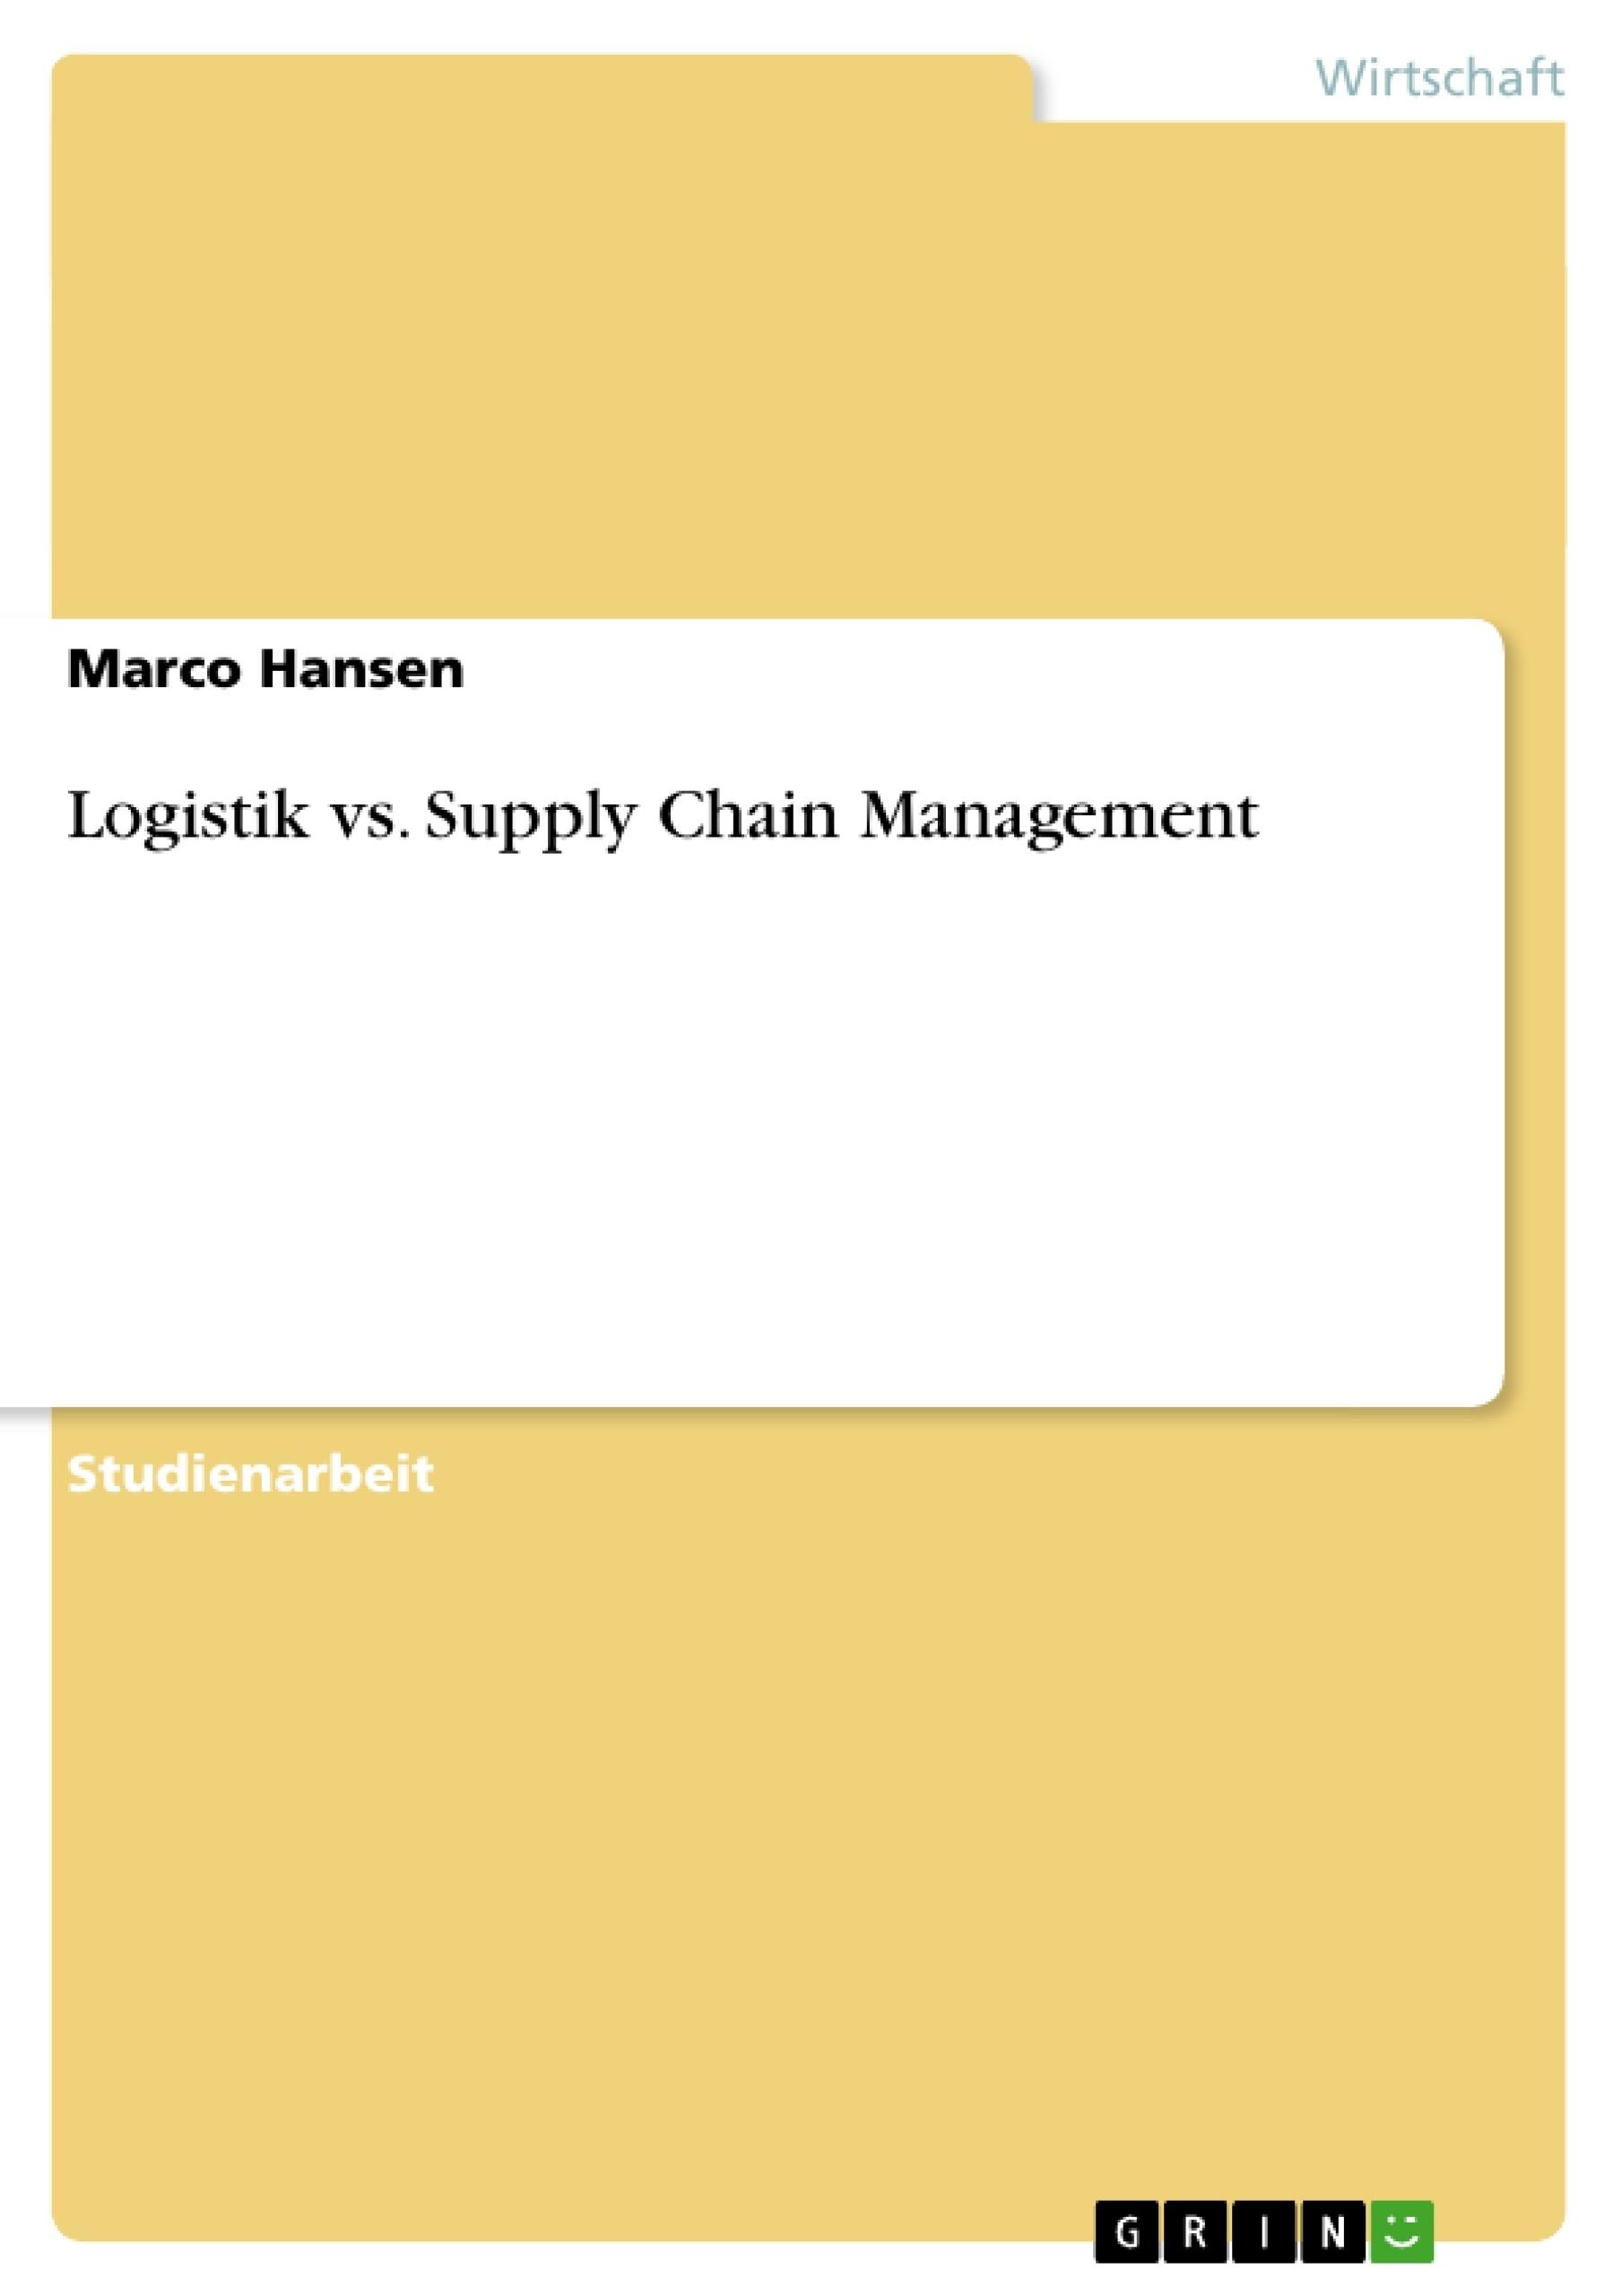 Titel: Logistik vs. Supply Chain Management